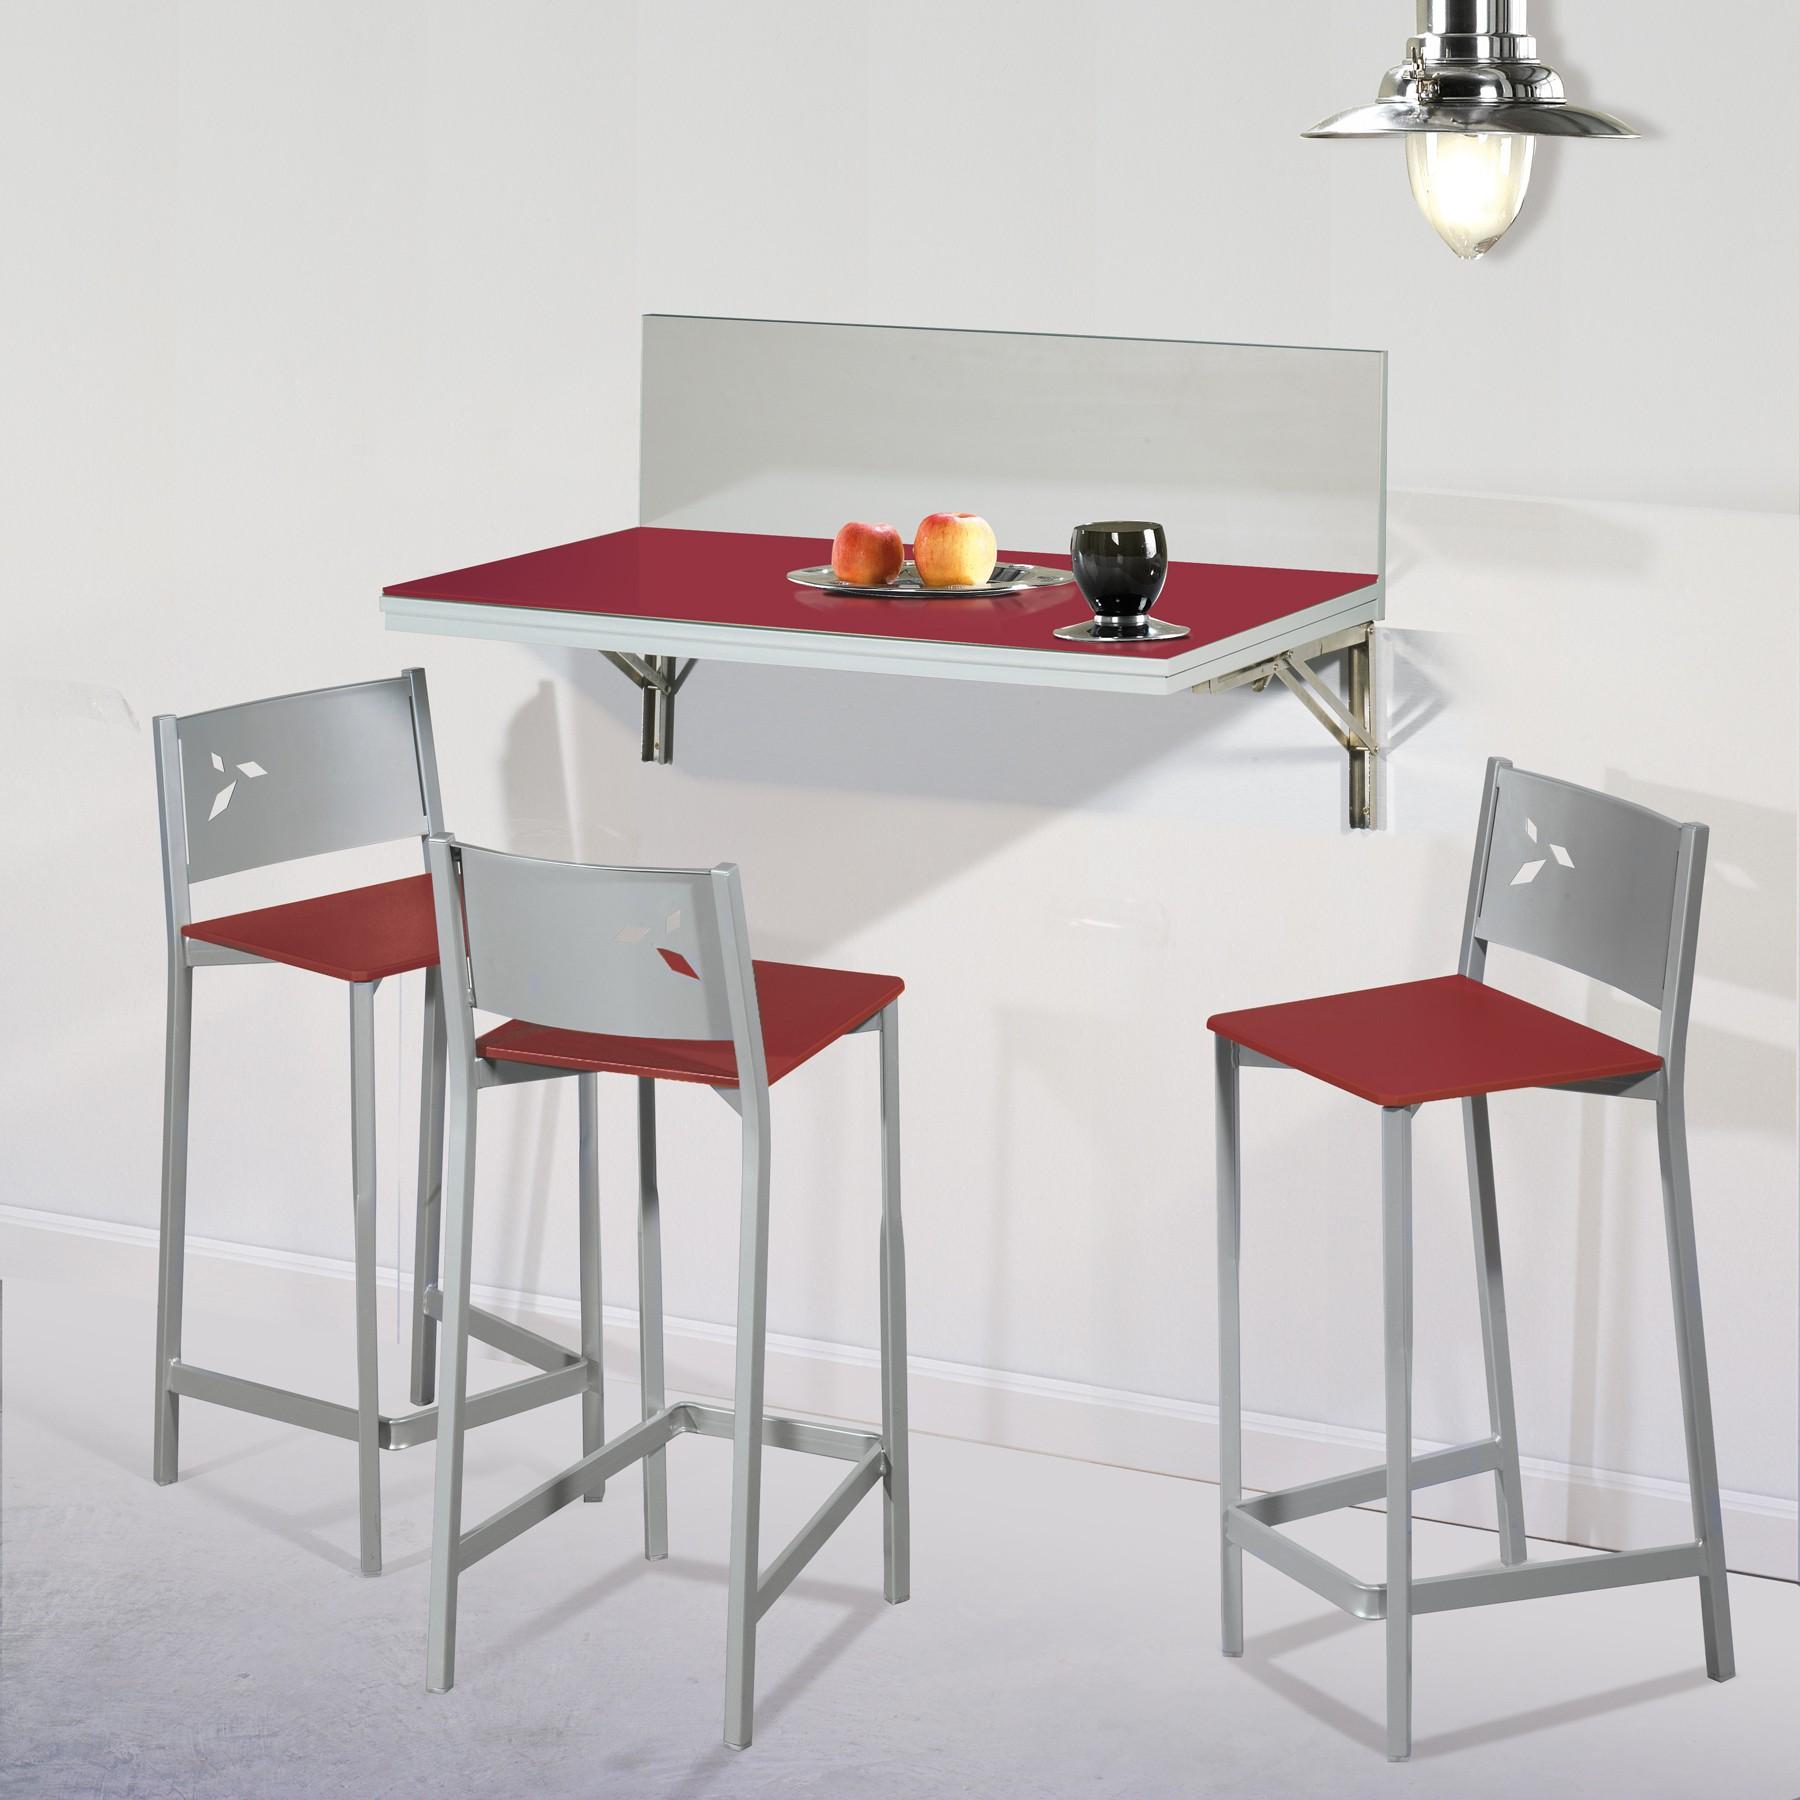 Pack ahorro en mesa de cocina de pared con dos taburetes modelo dkg - Mesas cocina baratas ...